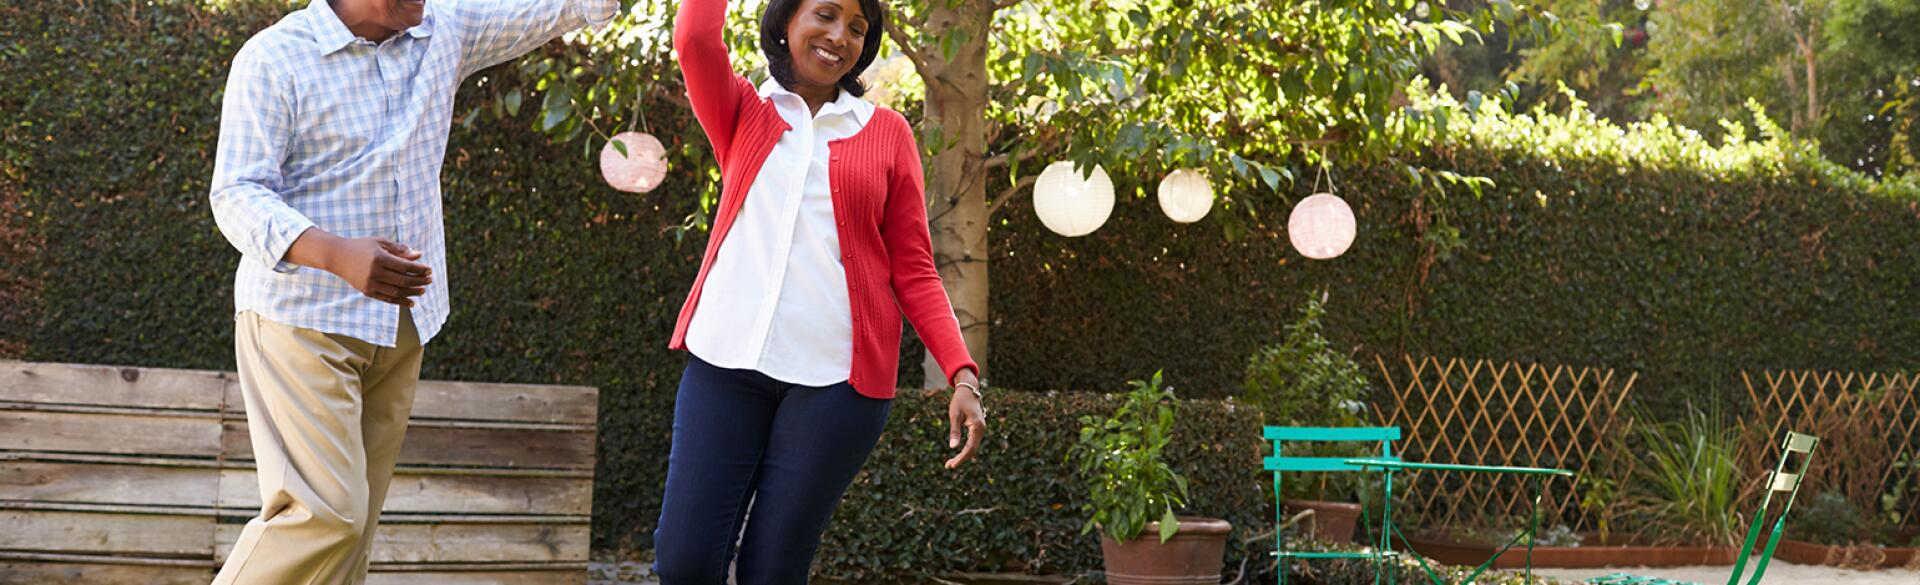 image_of_black_couple_dancing_in_yard_GettyImages-638287822_1540.jpg